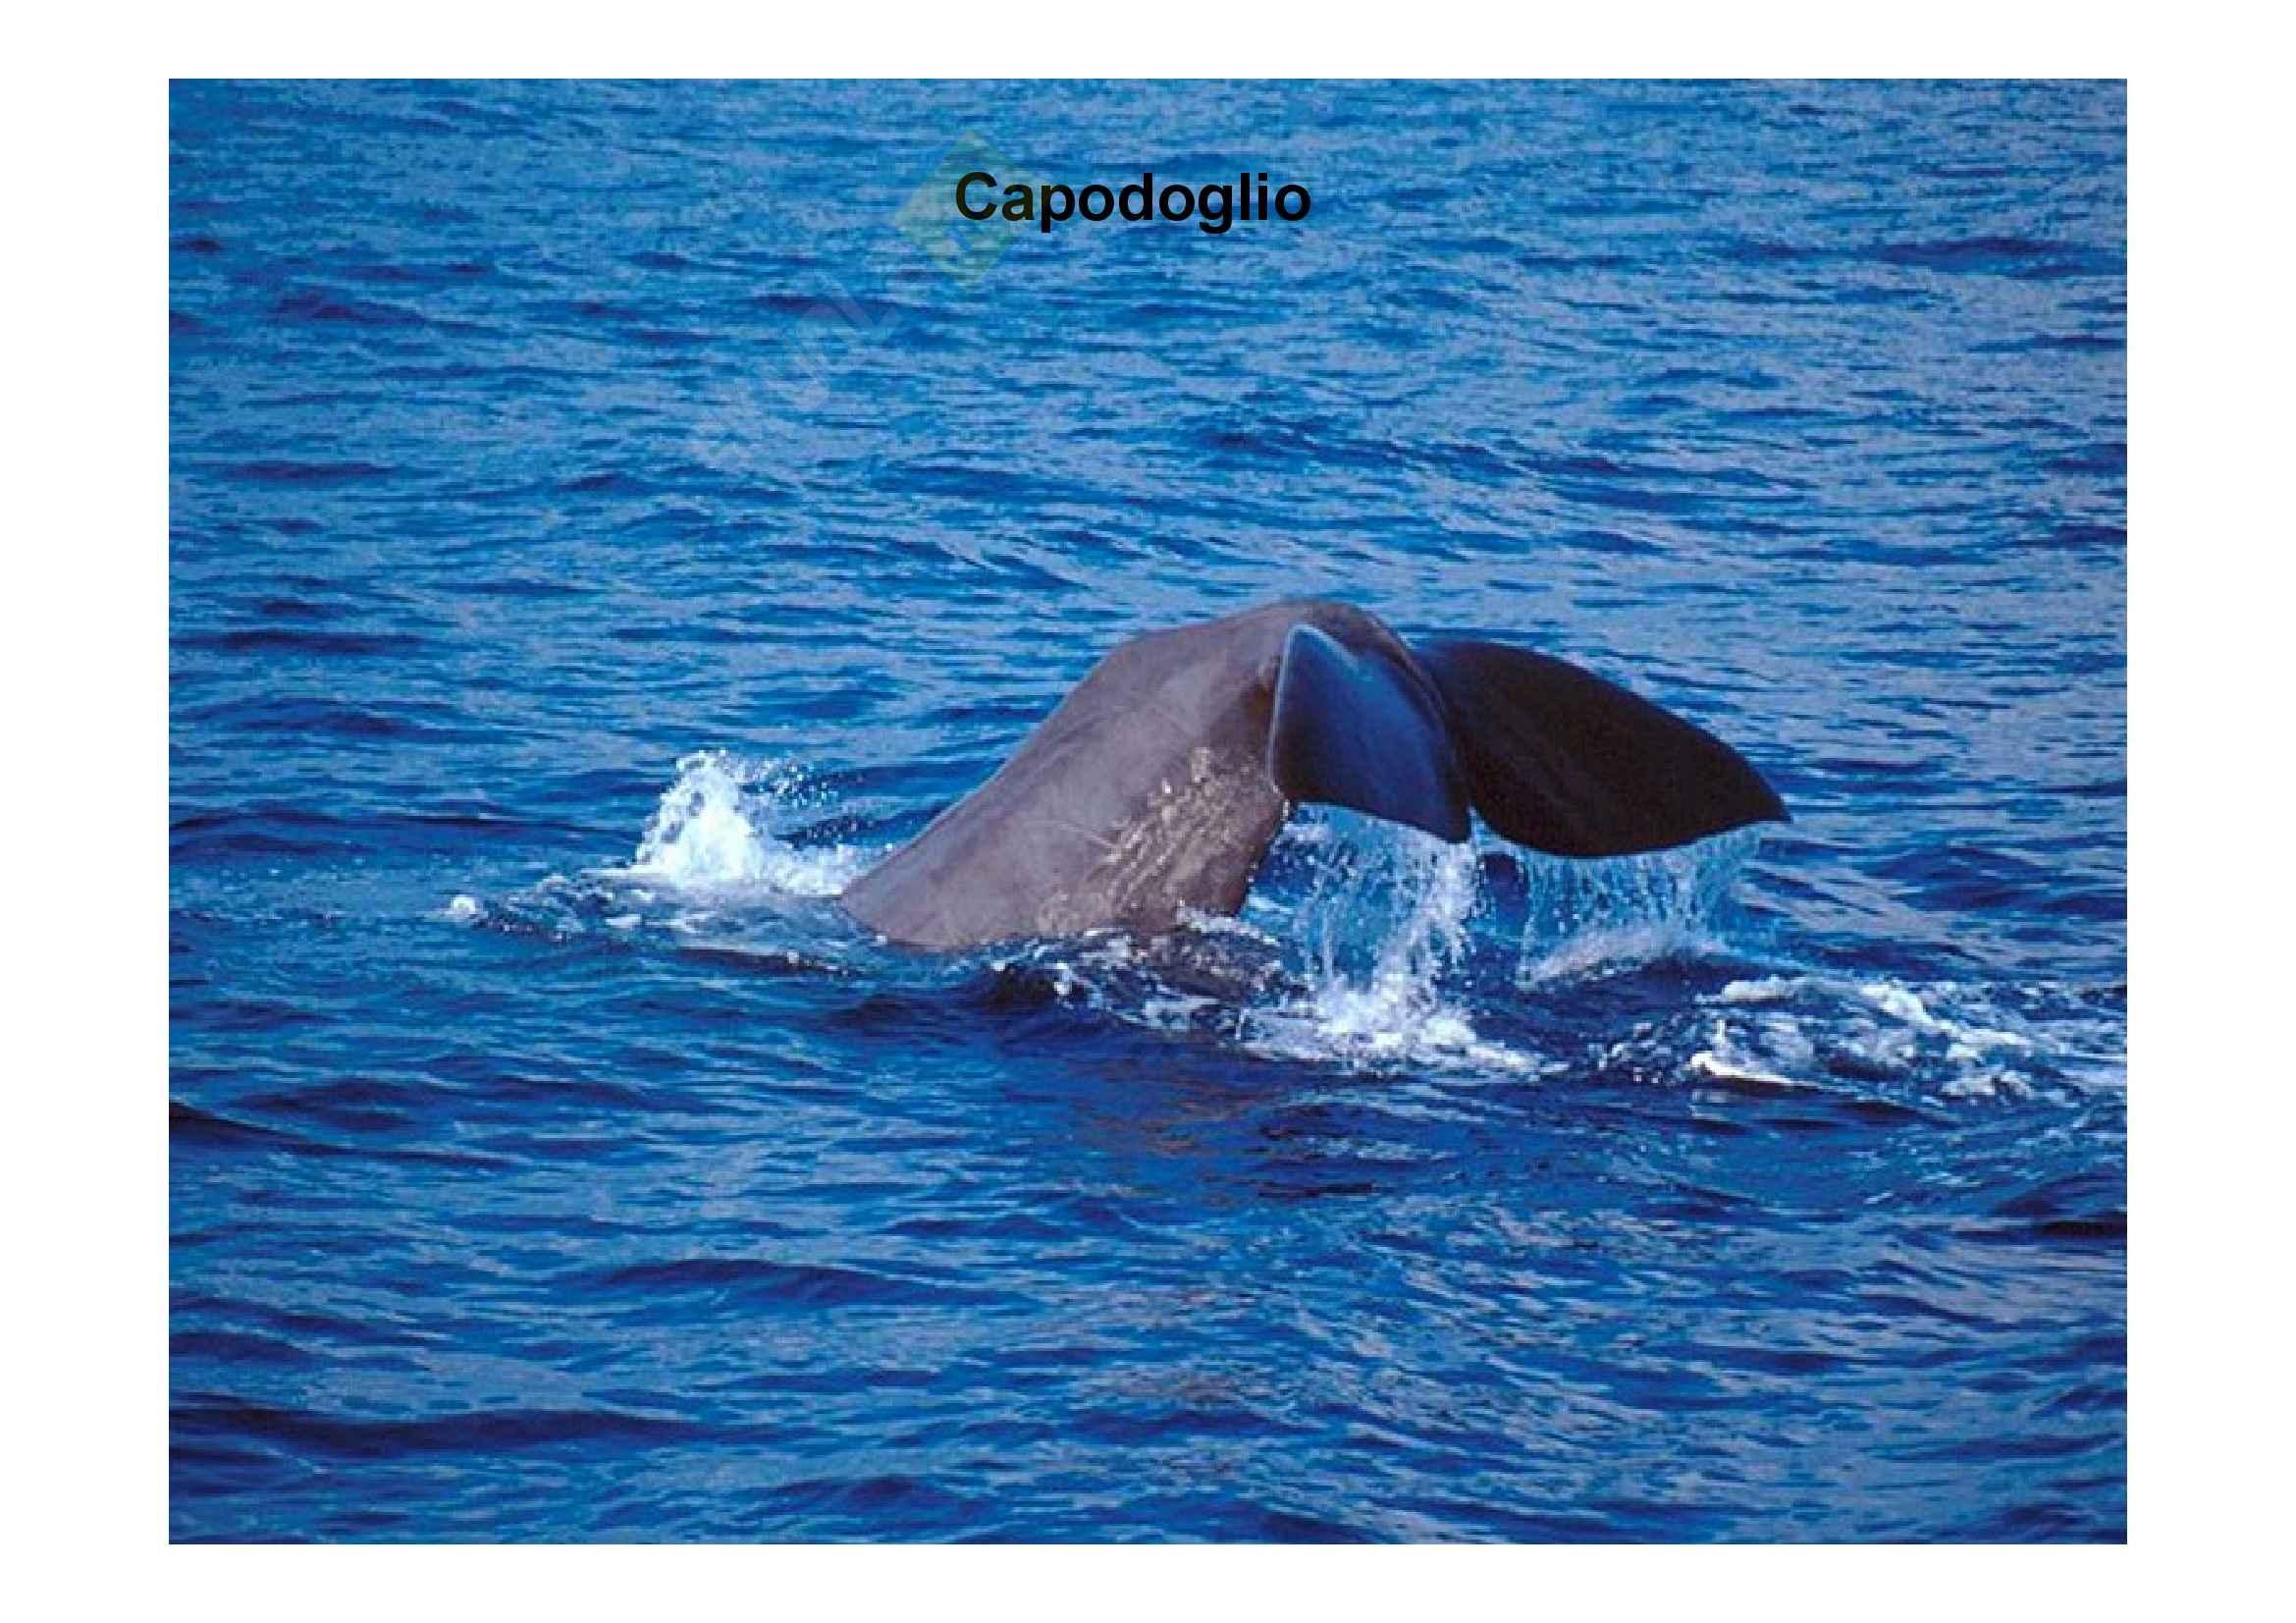 Zoologia - mammiferi marini Pag. 76